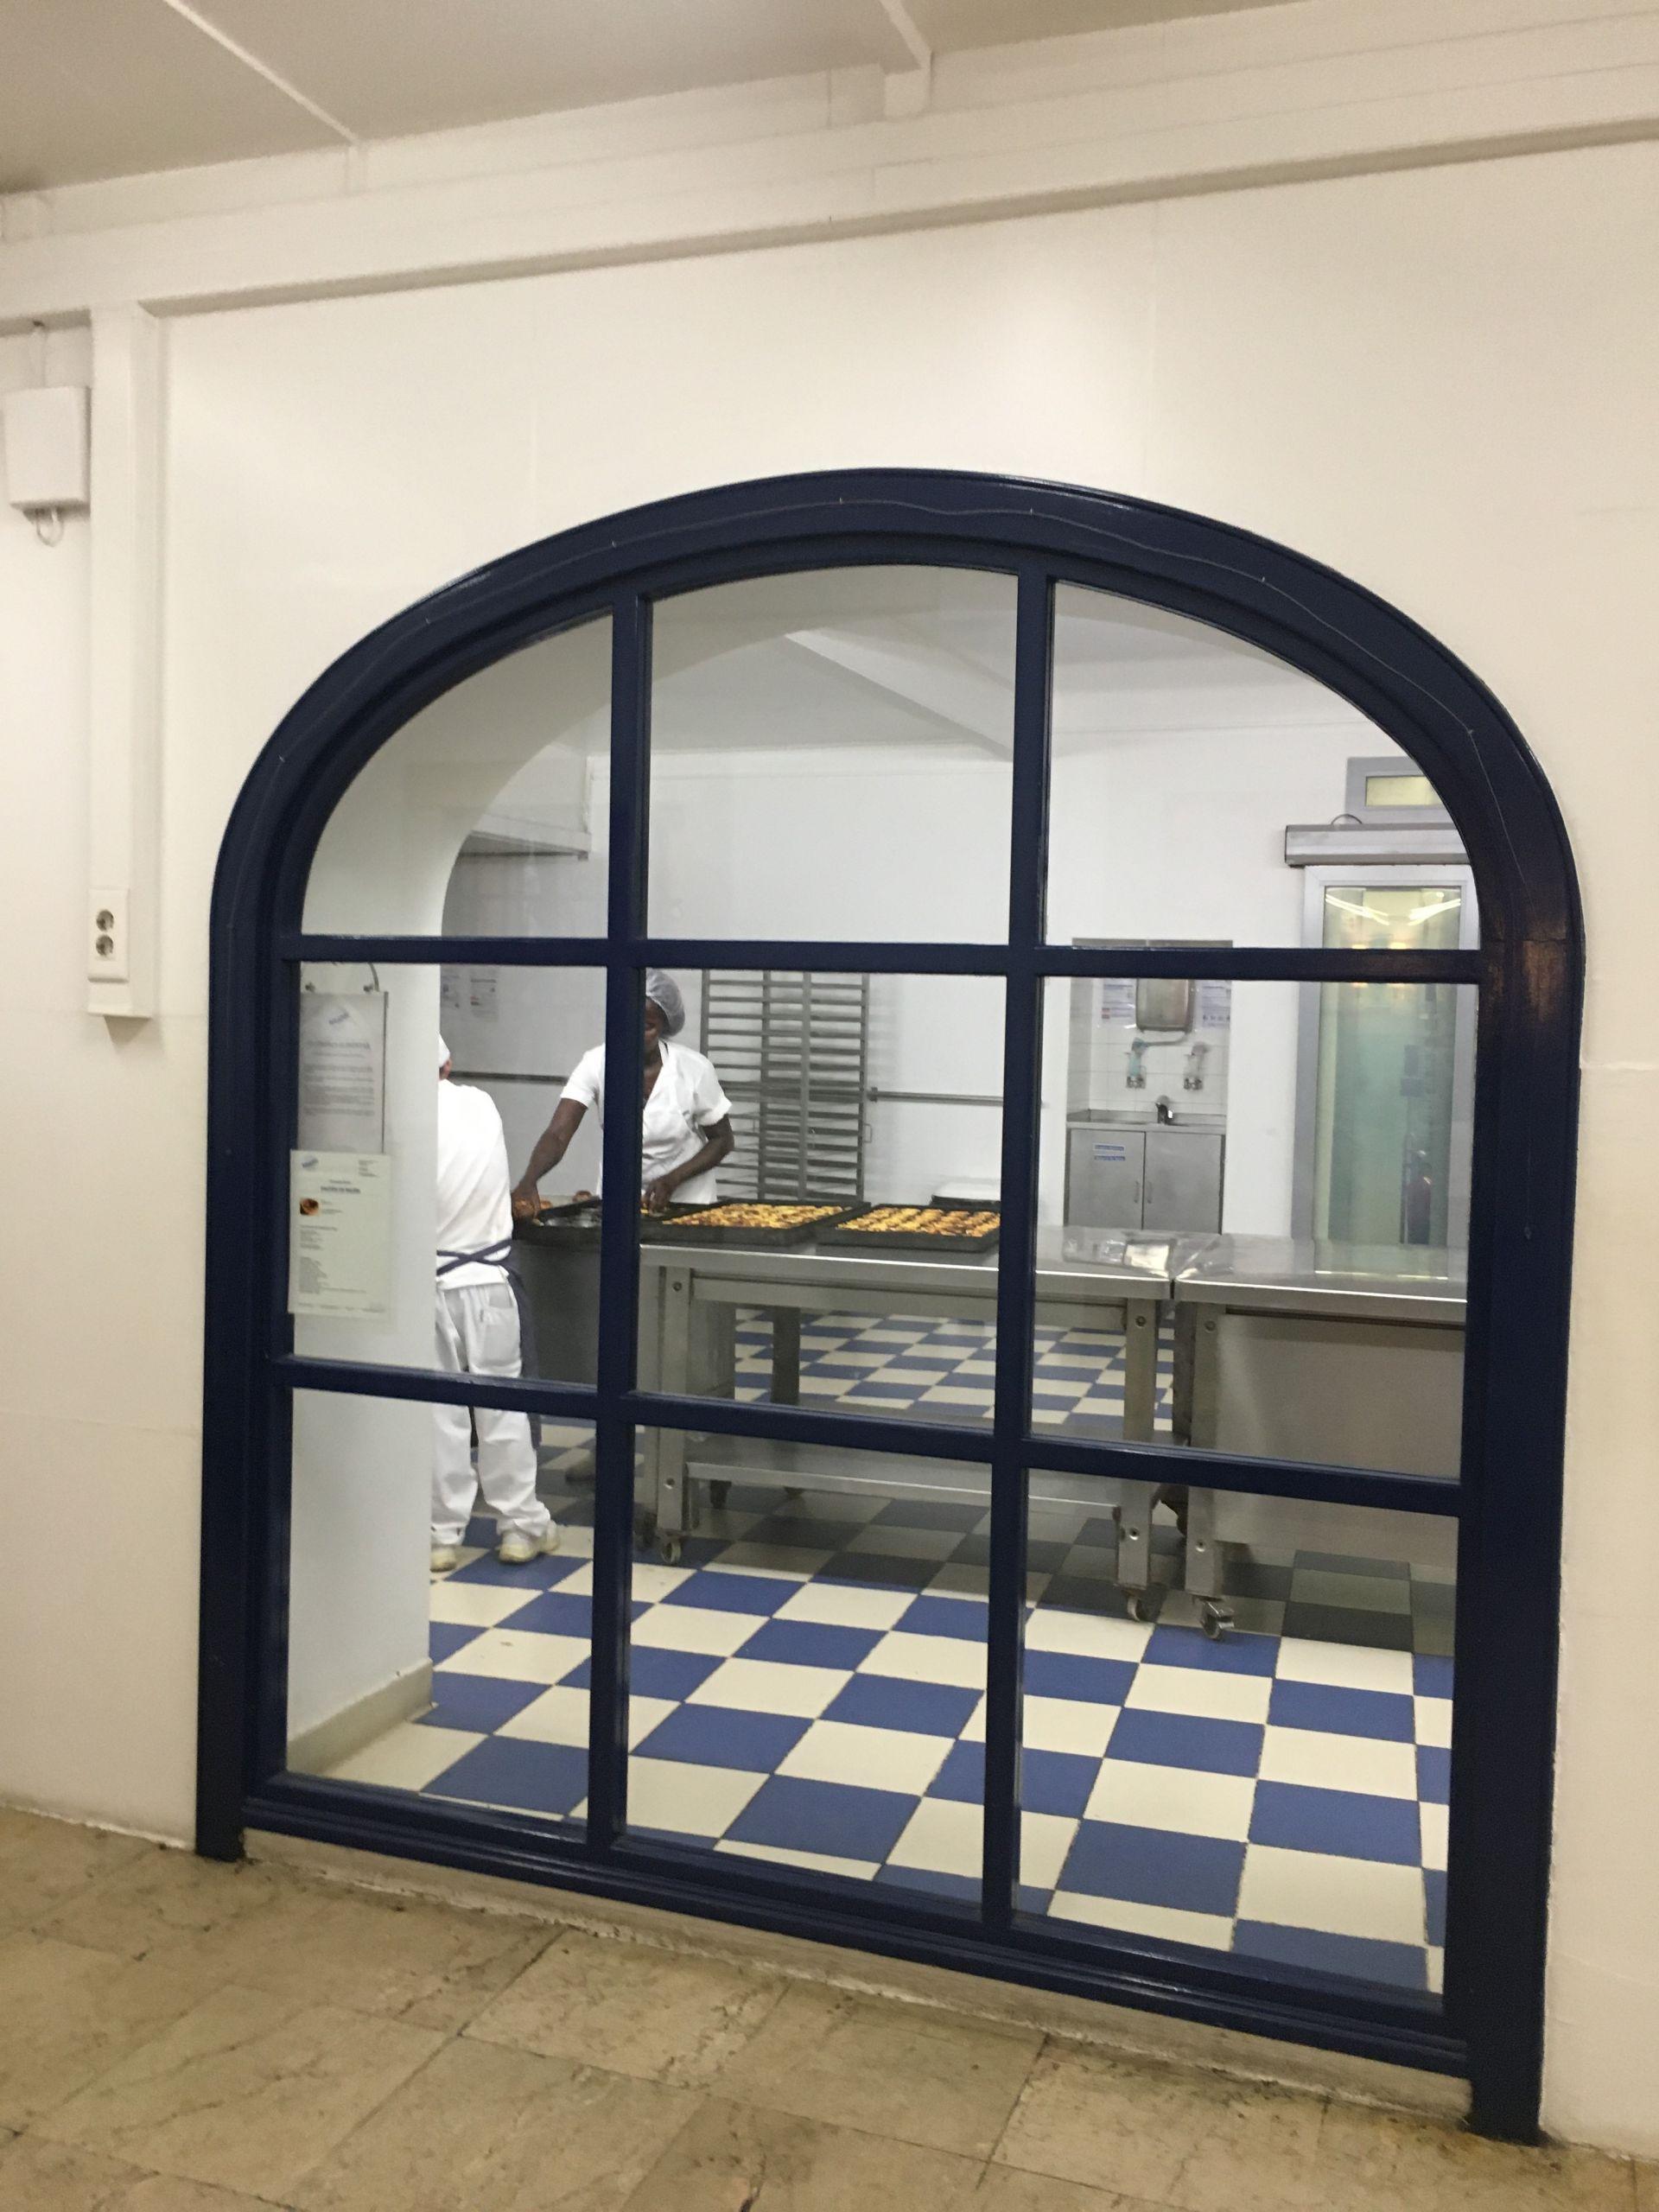 Lisbon-Pasteis de Belem bakery